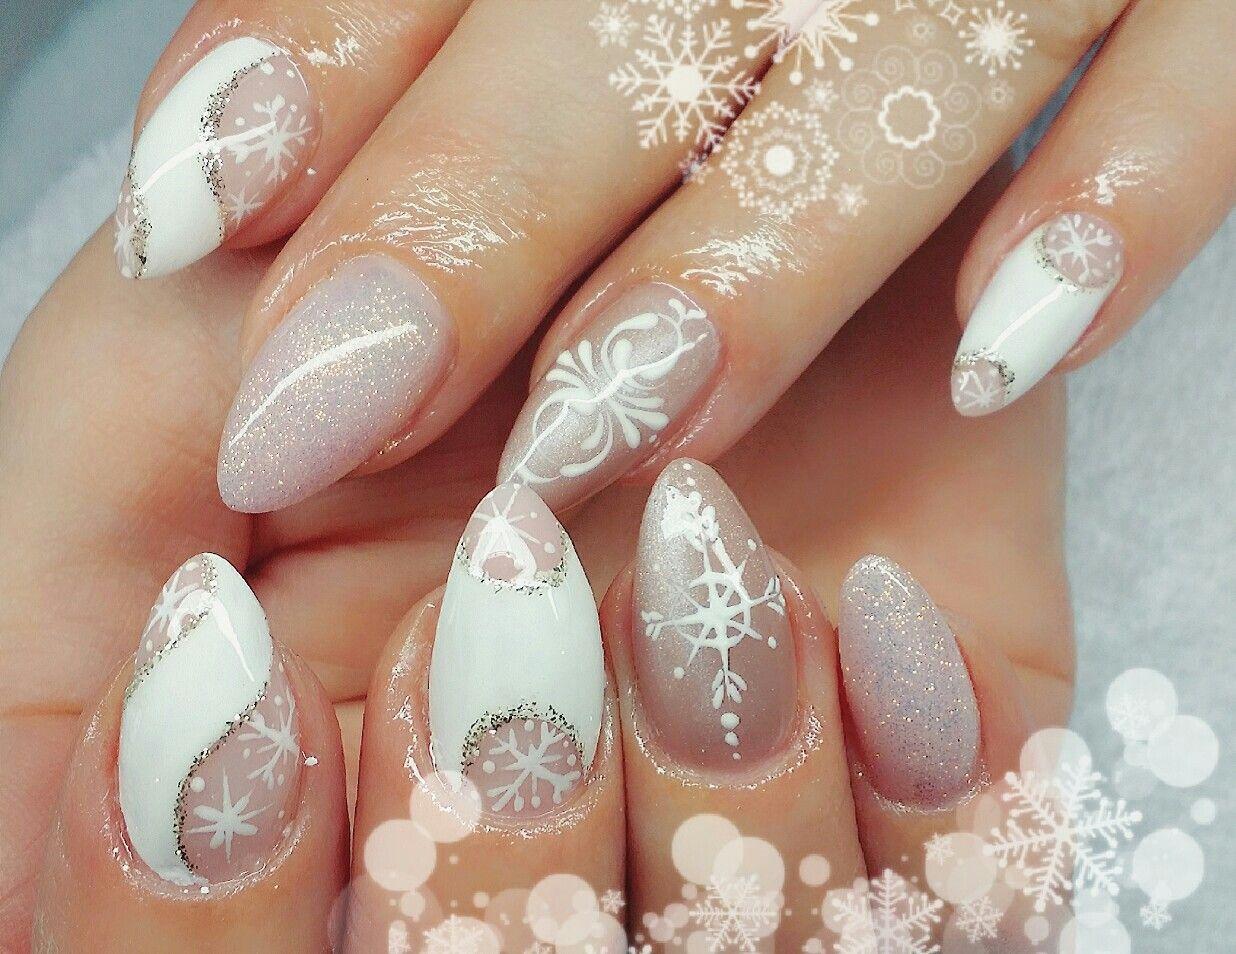 Nail Design Winter | Fabulous Nails | Pinterest | Fabulous nails and ...